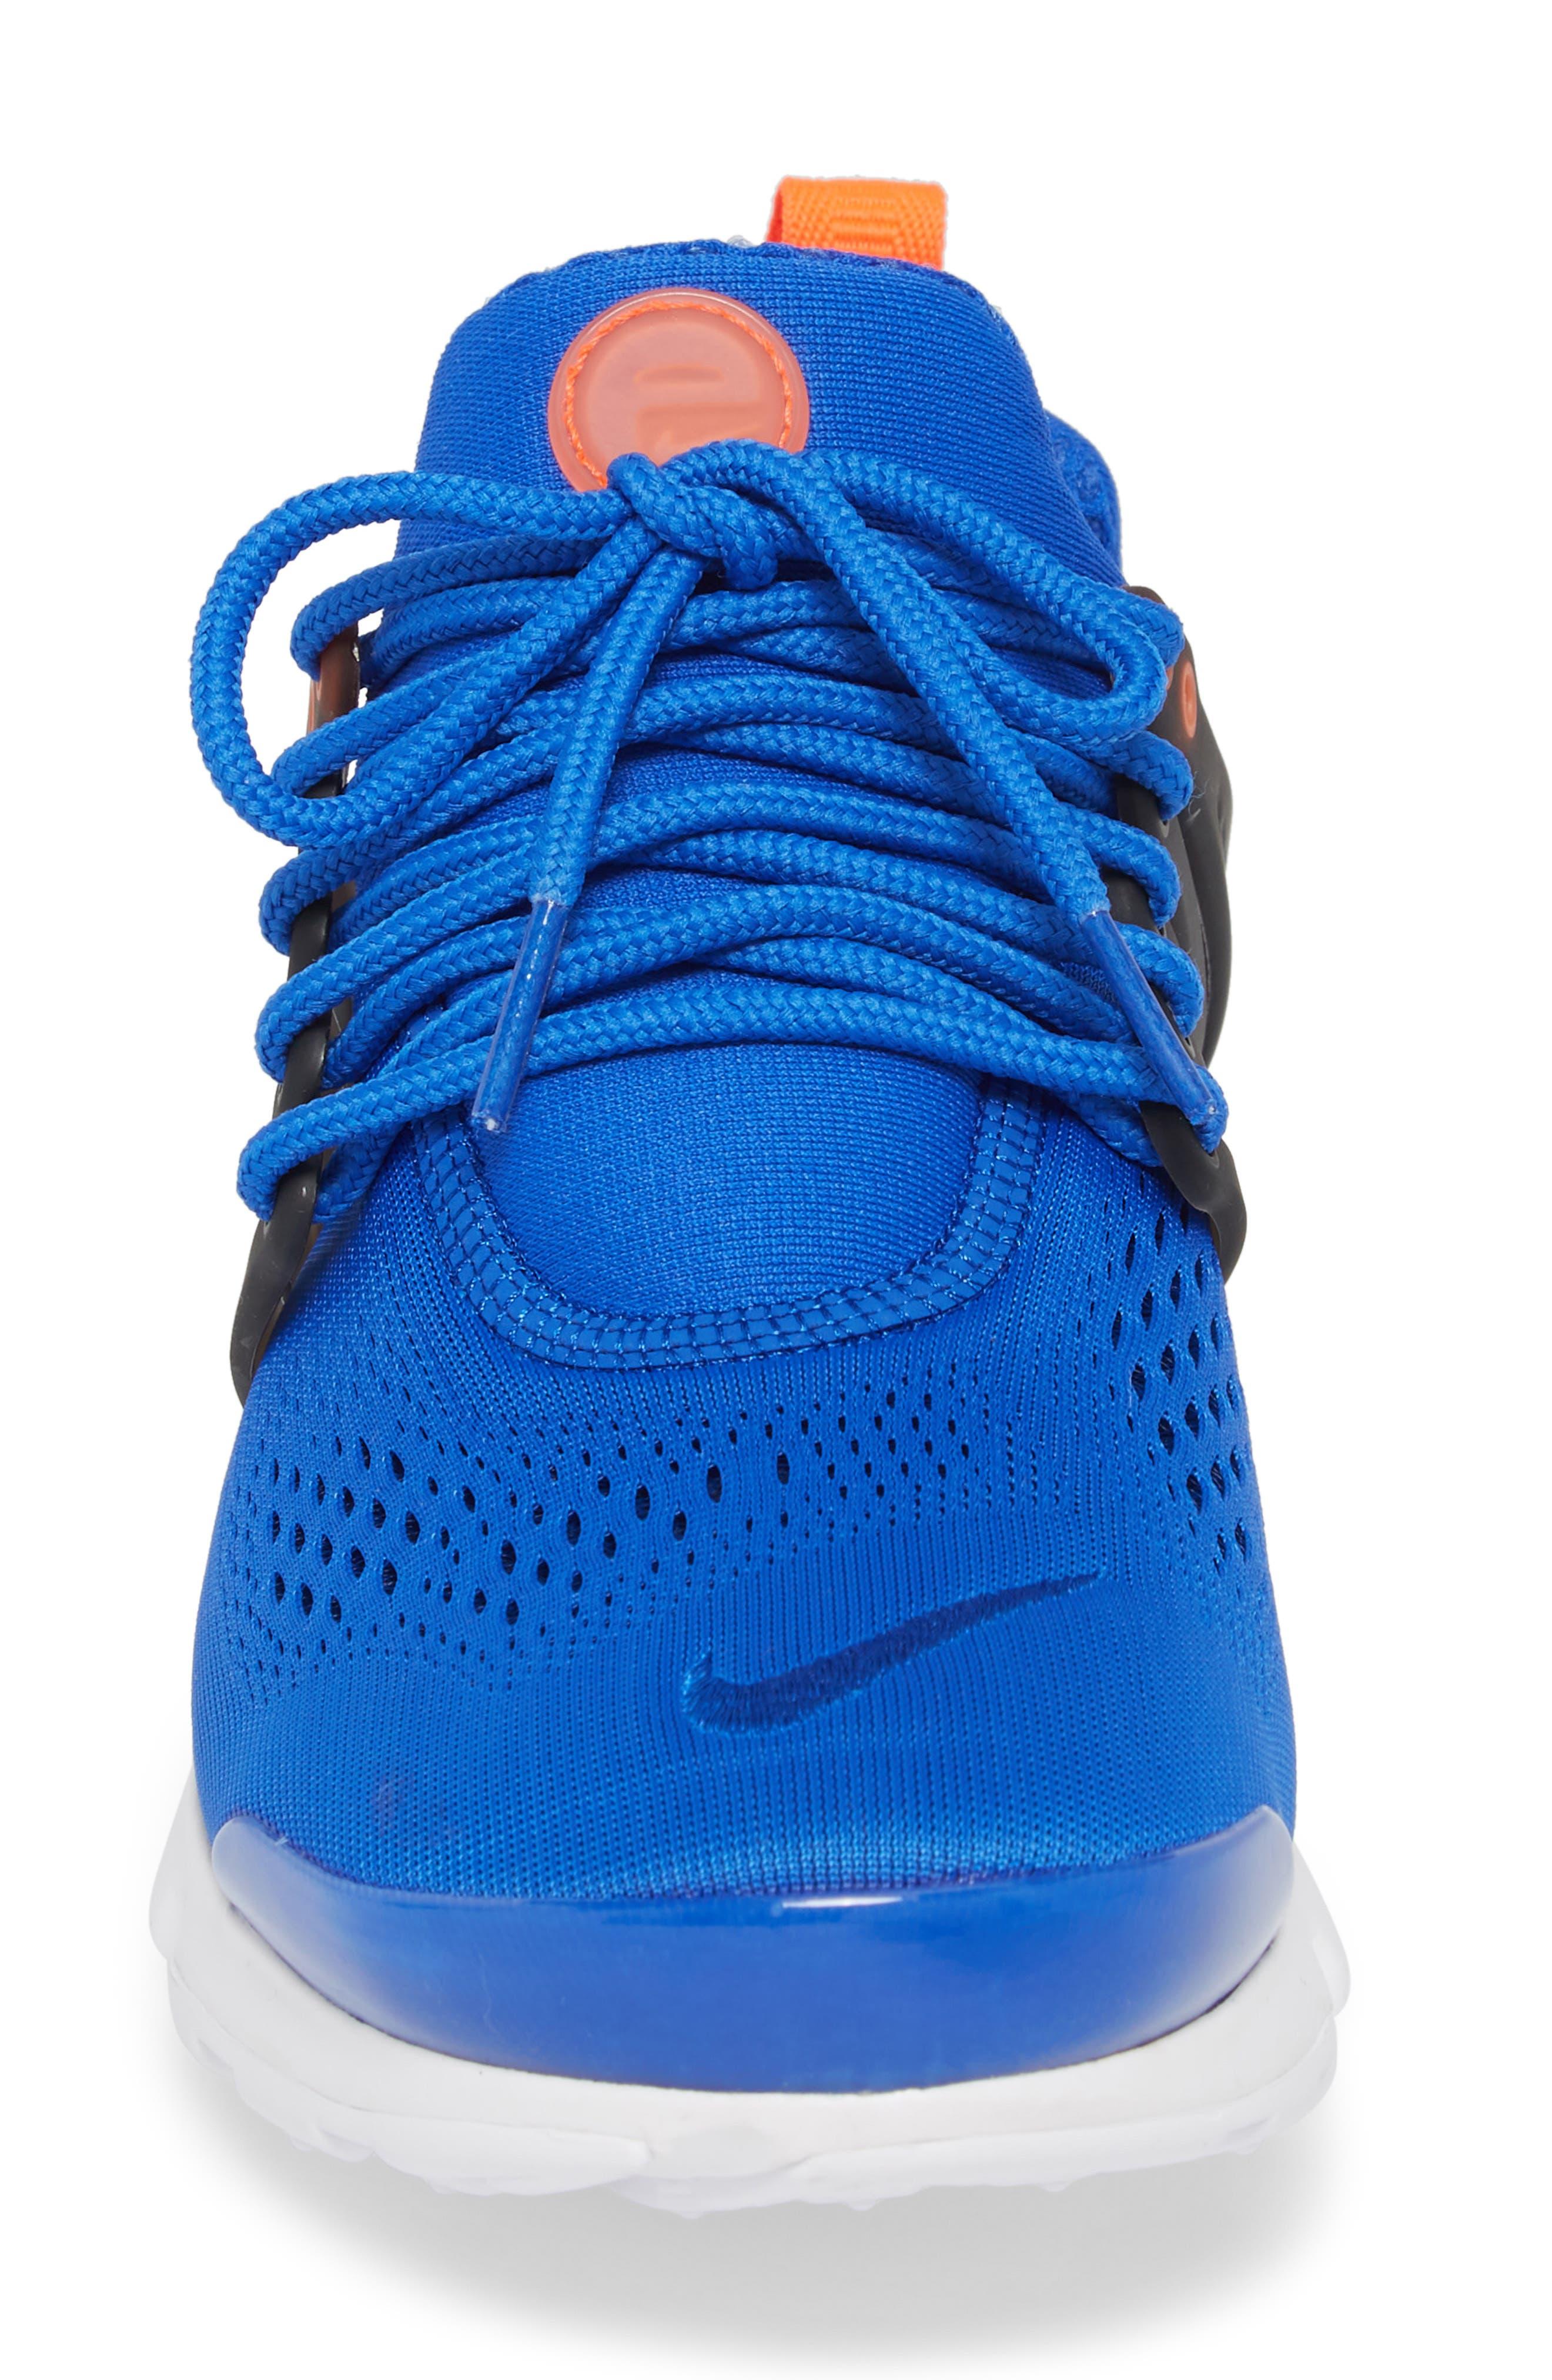 Air Presto Ultra Breathe Sneaker,                             Alternate thumbnail 4, color,                             Racer Blue/ Total Crimson